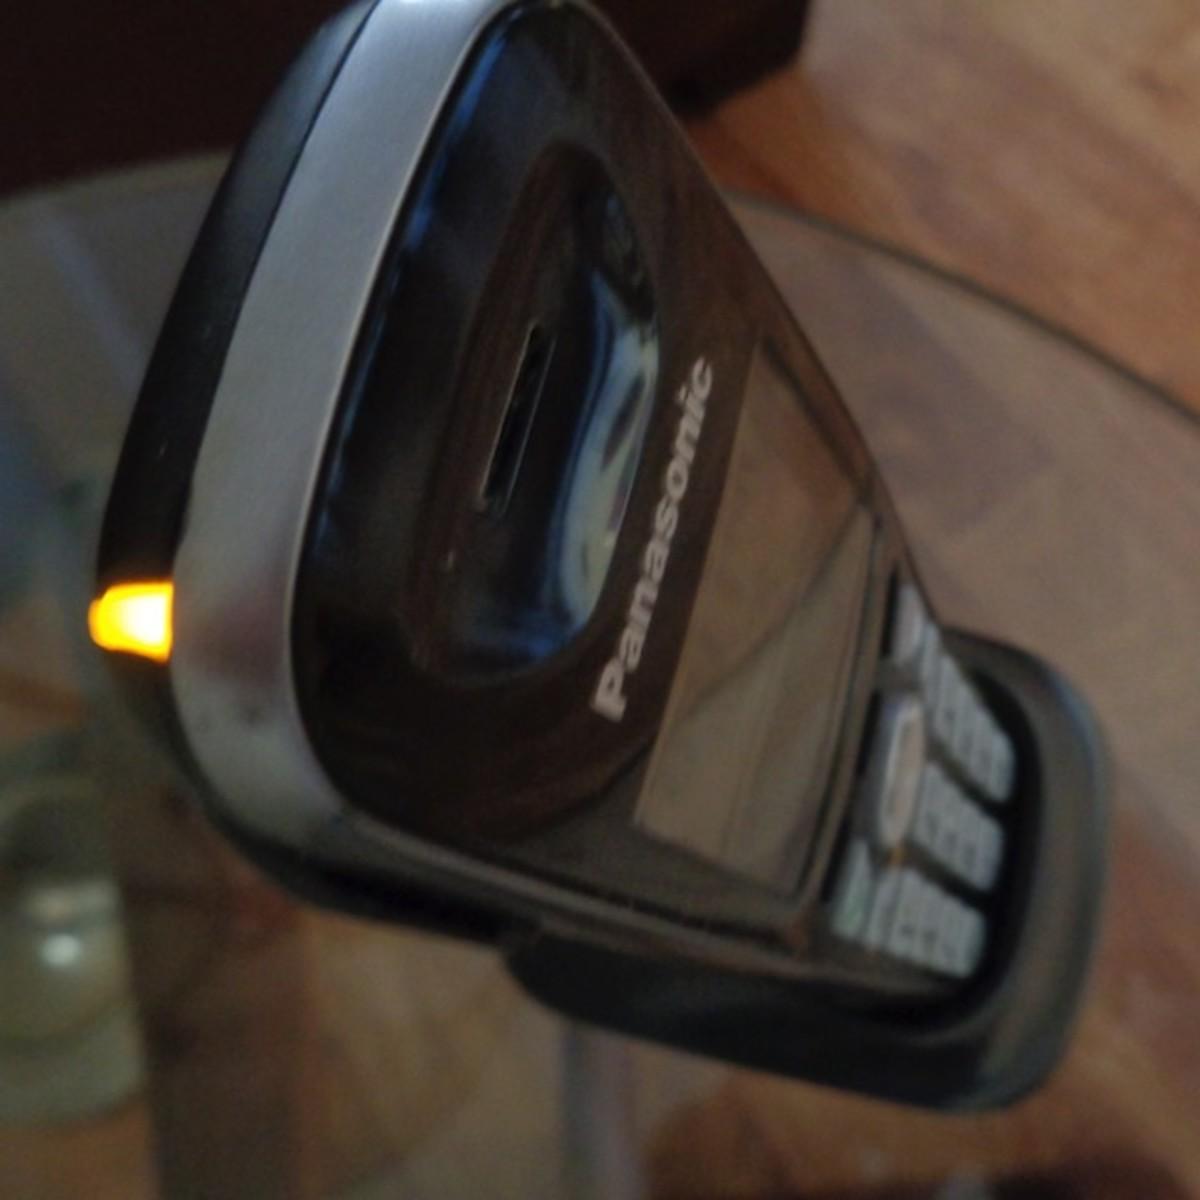 Message Indicator on Panasonic Phone